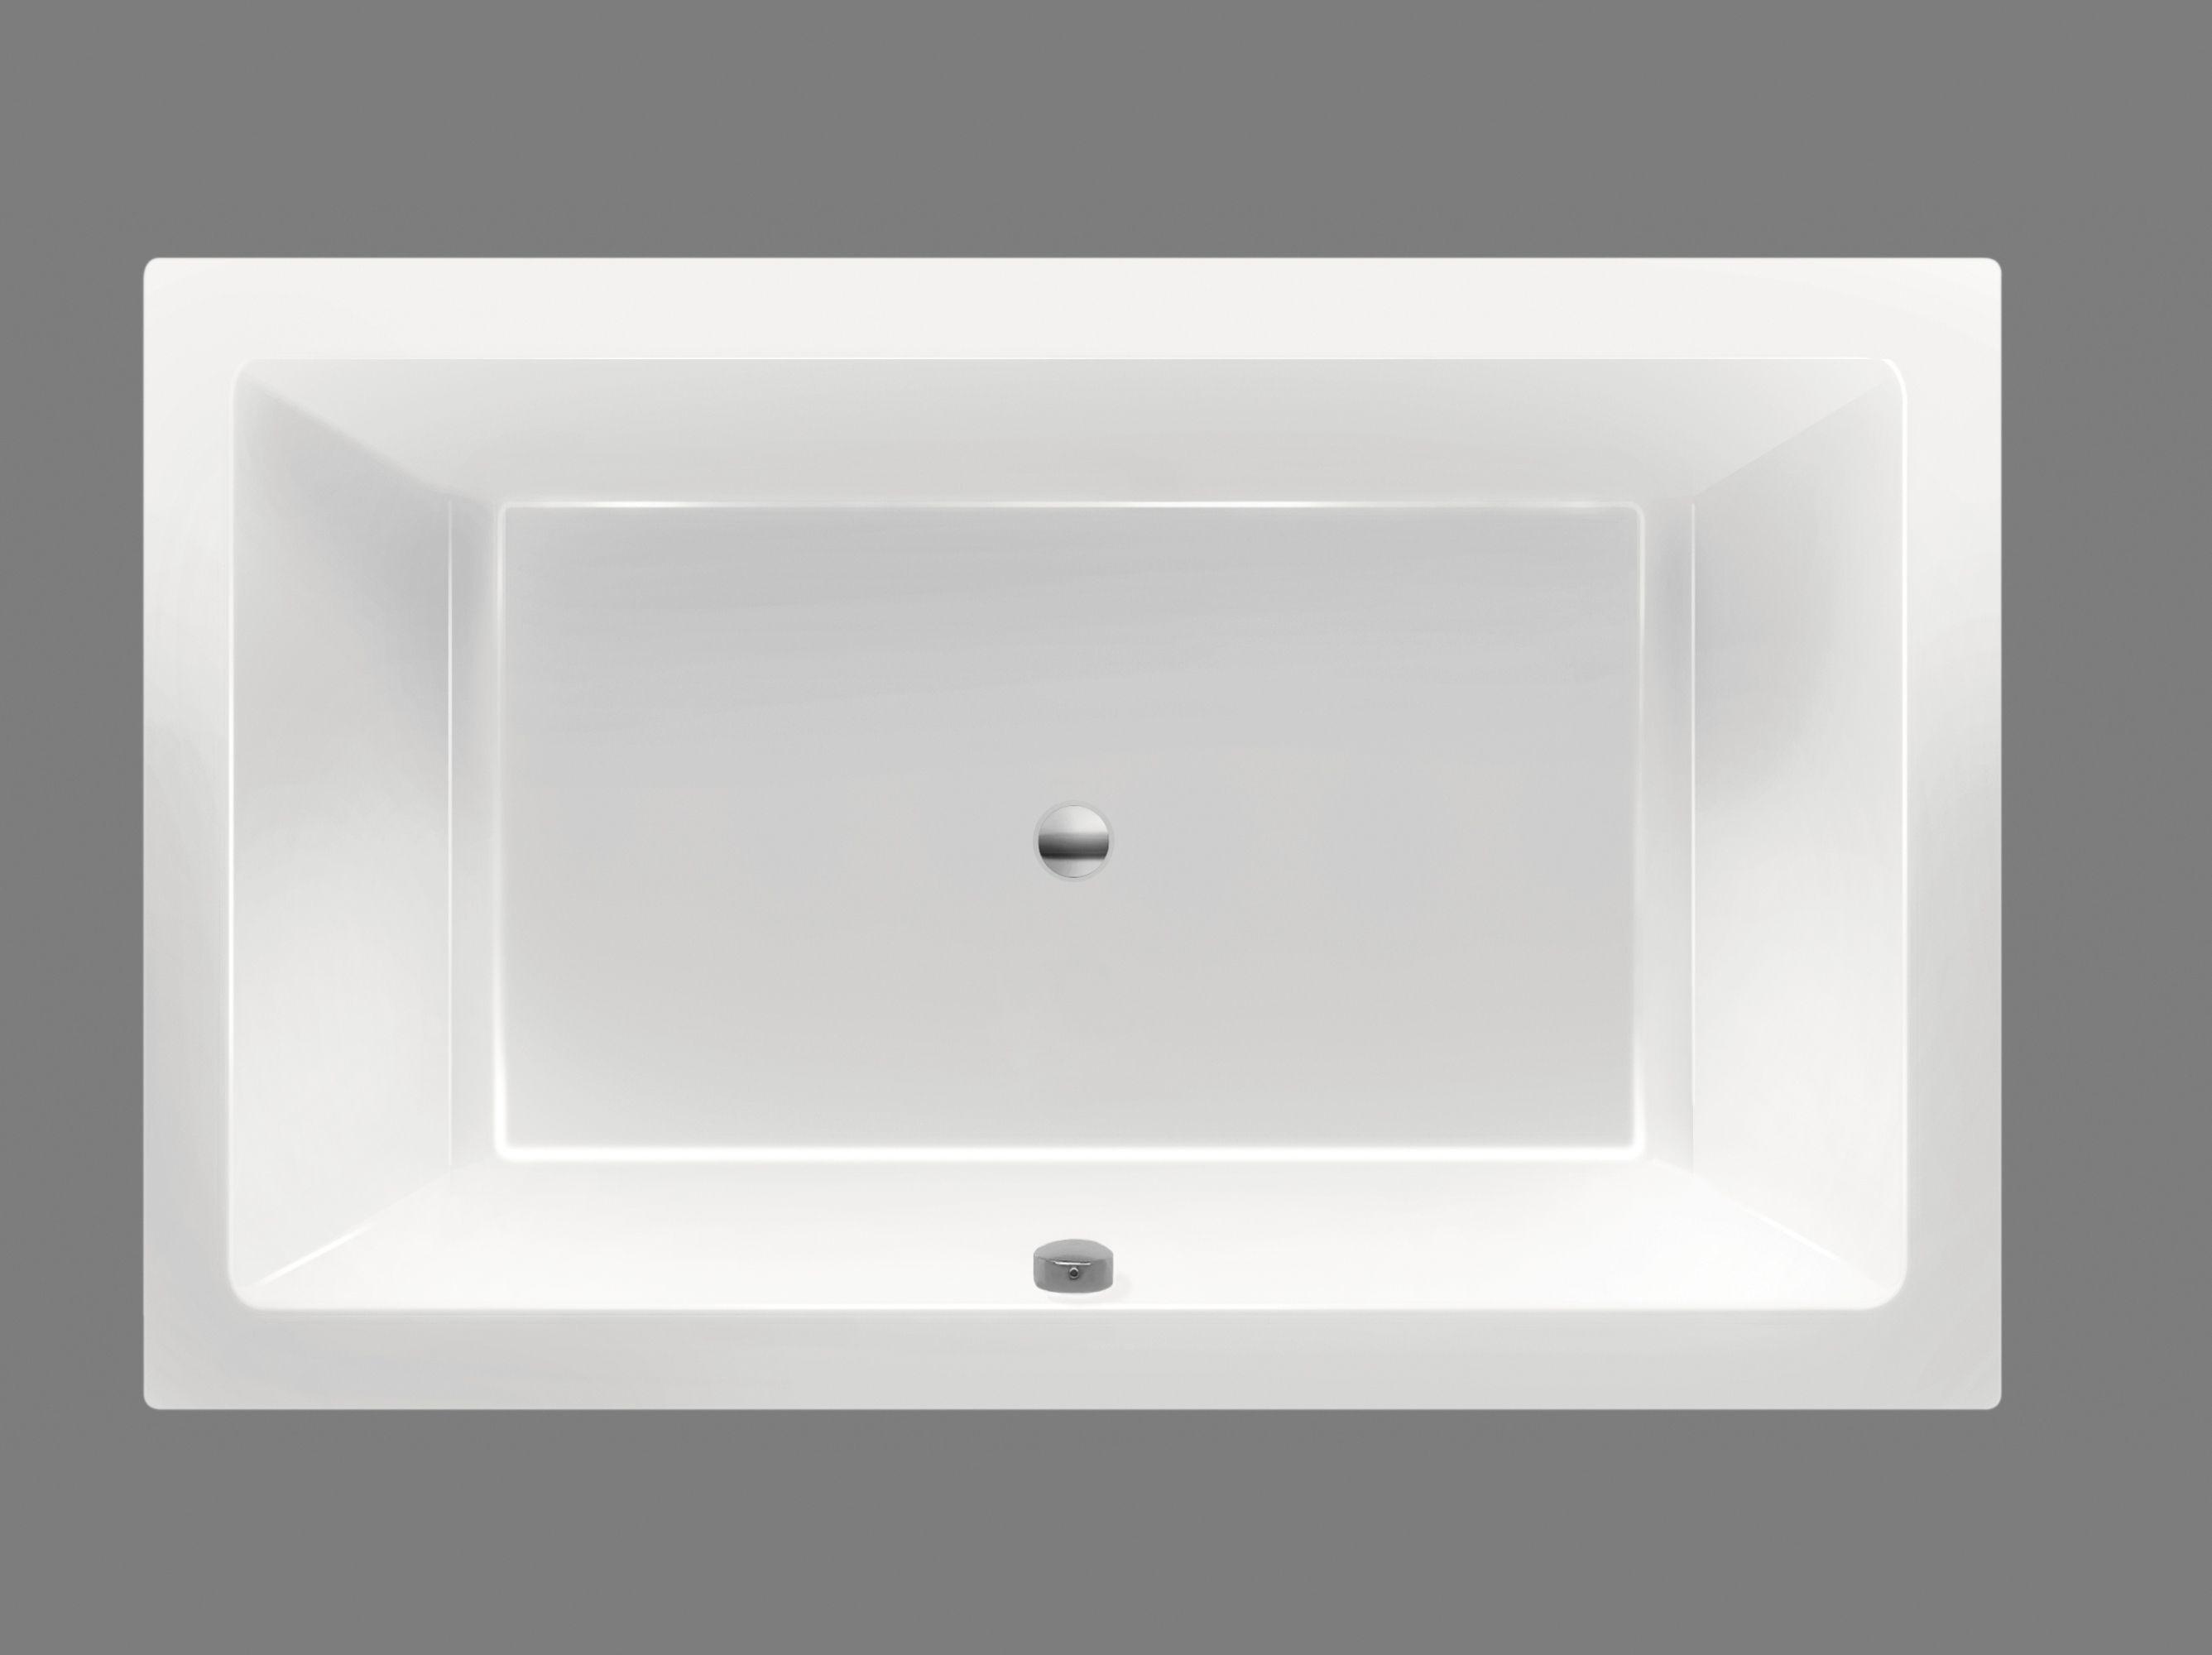 Xenz Society ligbad 190x120x50cm bahama beige